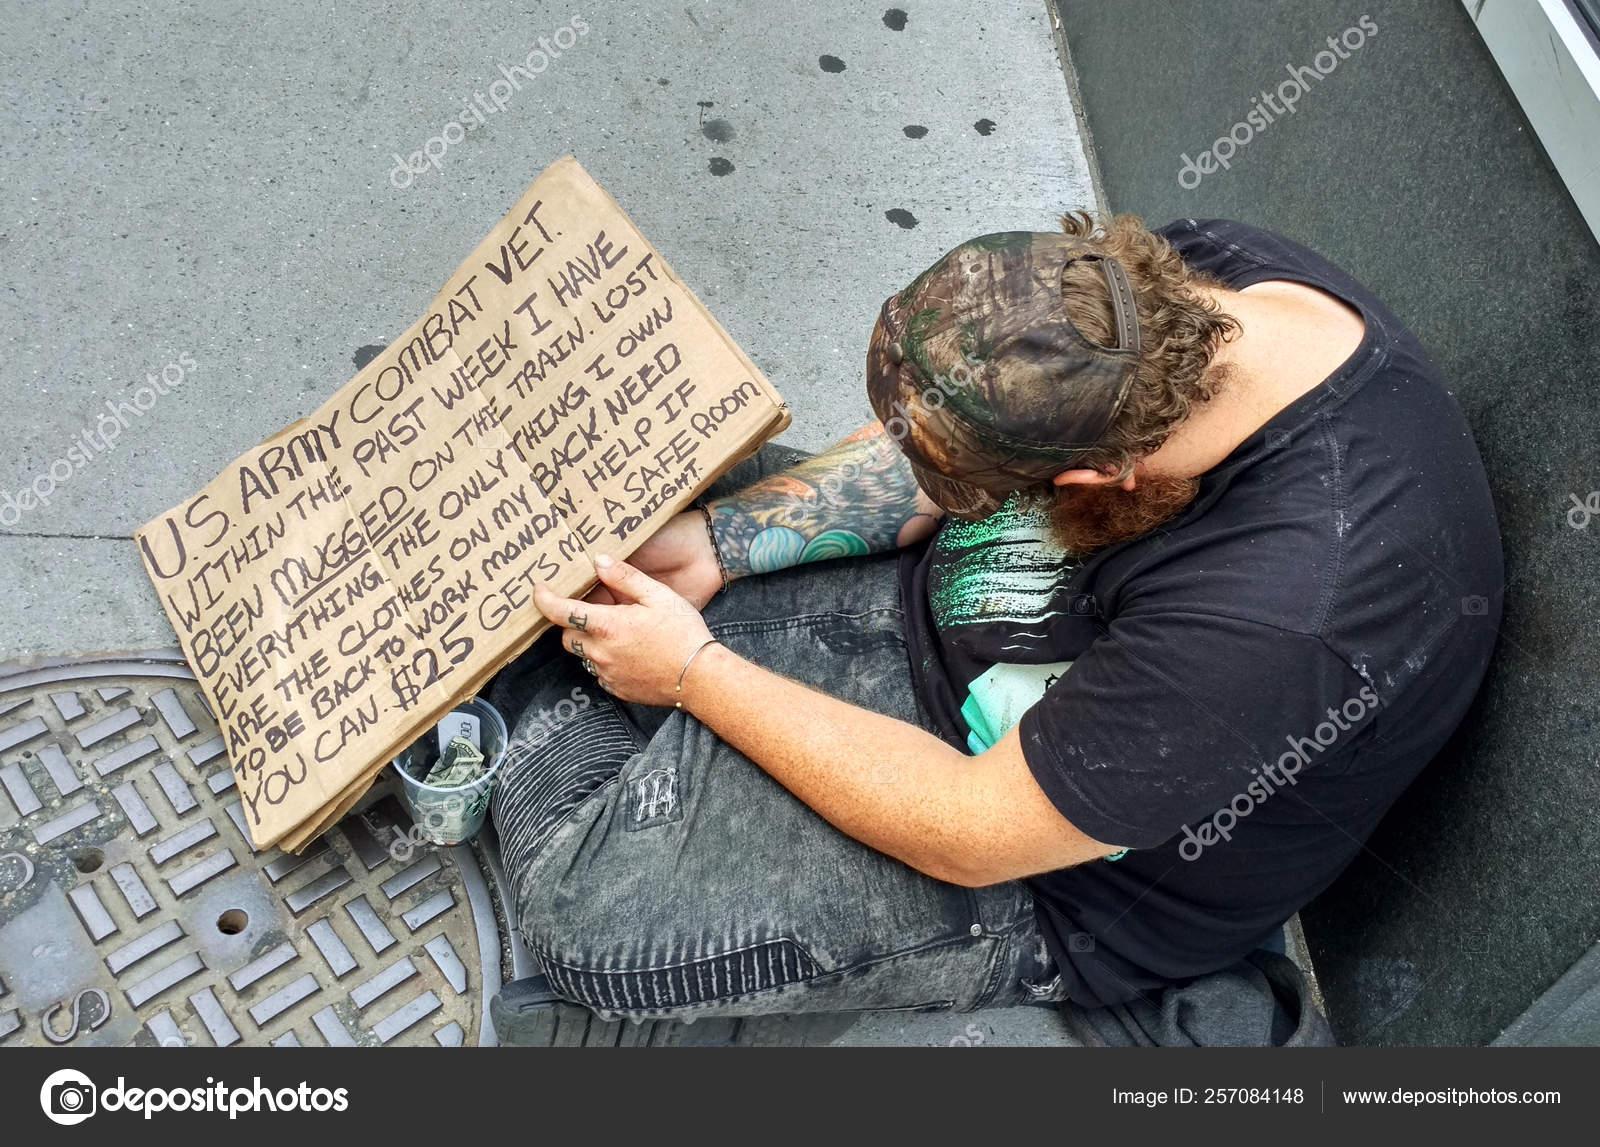 depositphotos_257084148-stock-photo-homeless-person-usa-new-york.jpg